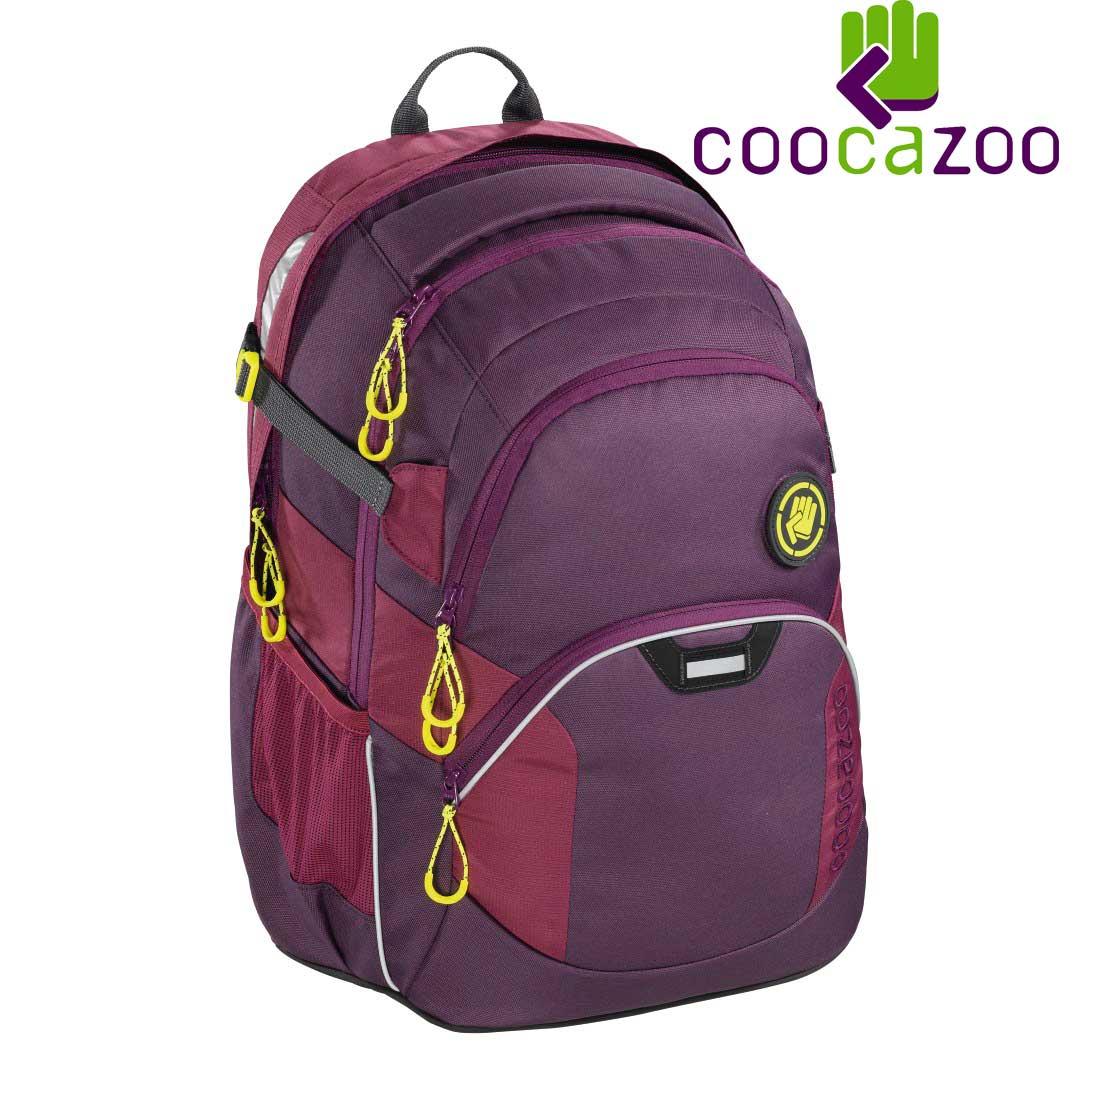 4e1d91db41 Školský ruksak Coocazoo. doprava zdarma. Školský batoh Coocazoo JobJobber2  Solid Berryman